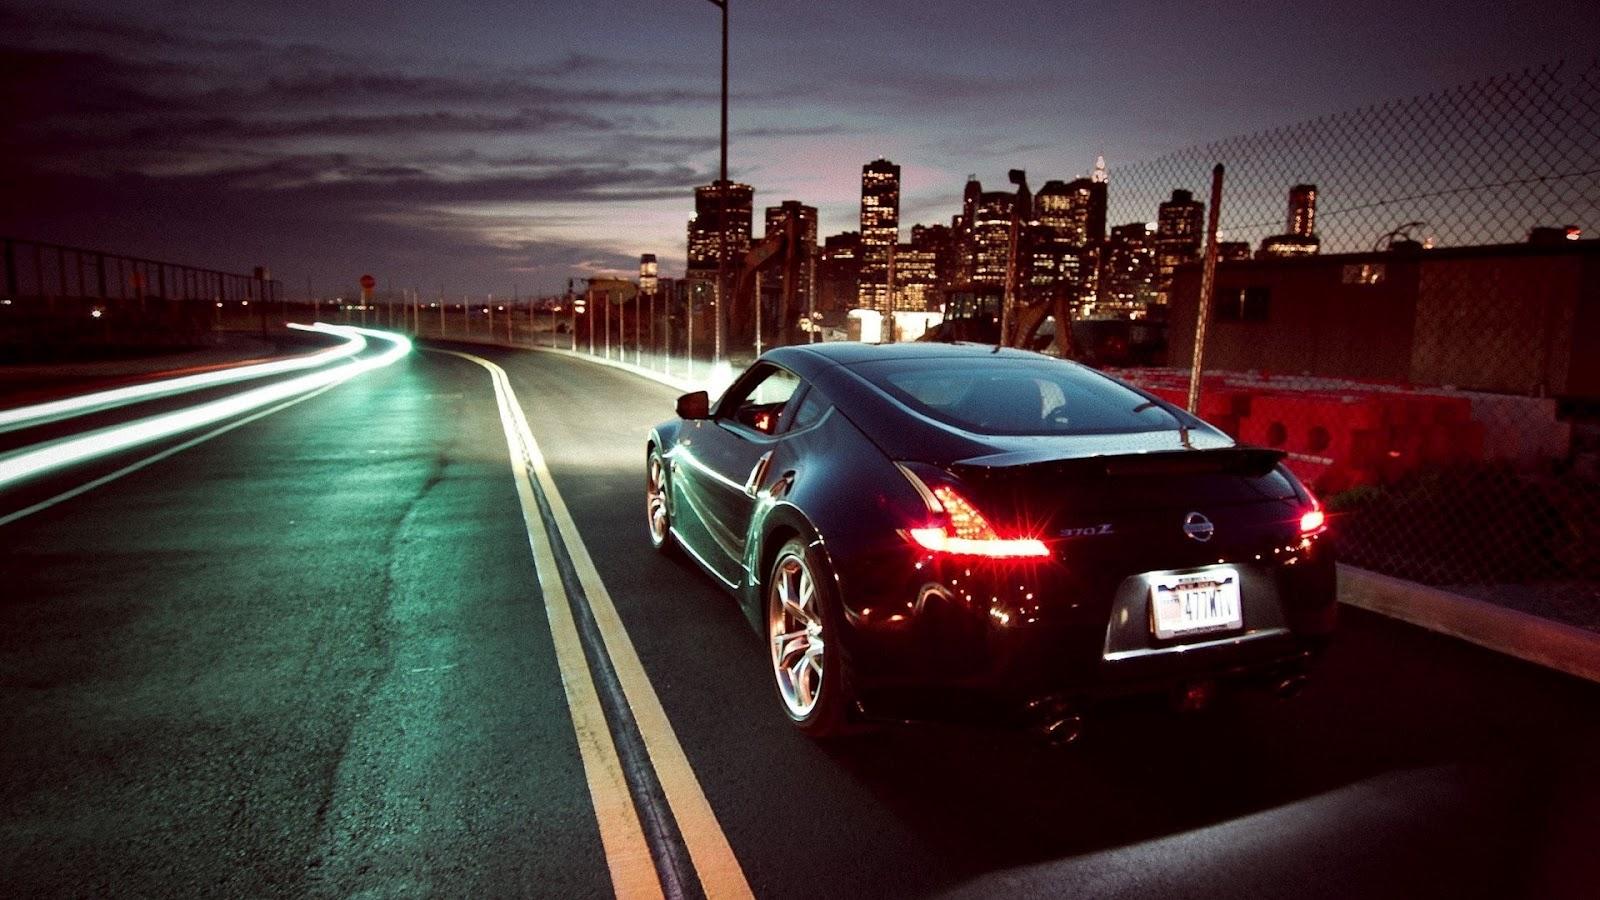 http://3.bp.blogspot.com/-rdmZKmd65Oo/T2uxBY8DLbI/AAAAAAAAA9U/bJPJvo-lleg/s1600/Nissan_370Z_Skyscrapers_Night_Lights_Photography_HD_Wallpaper.jpg